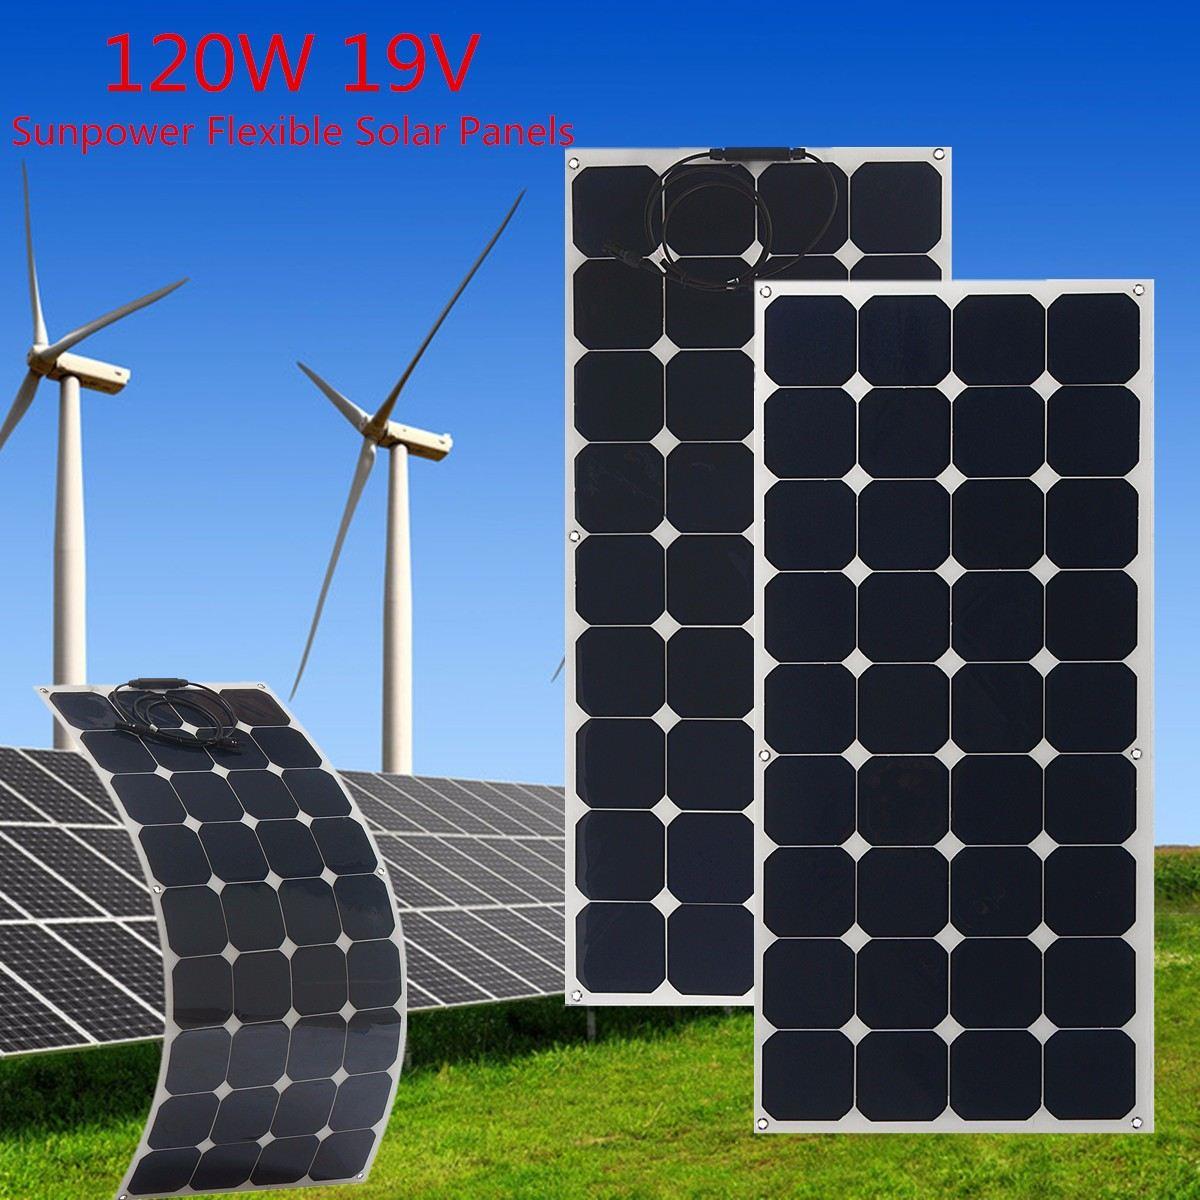 KINCO SP-27 120W/19V Semi-Flexible Solar Panel Monocrystalline Silicon Solar System Power Supply For Car Battery Charger стоимость